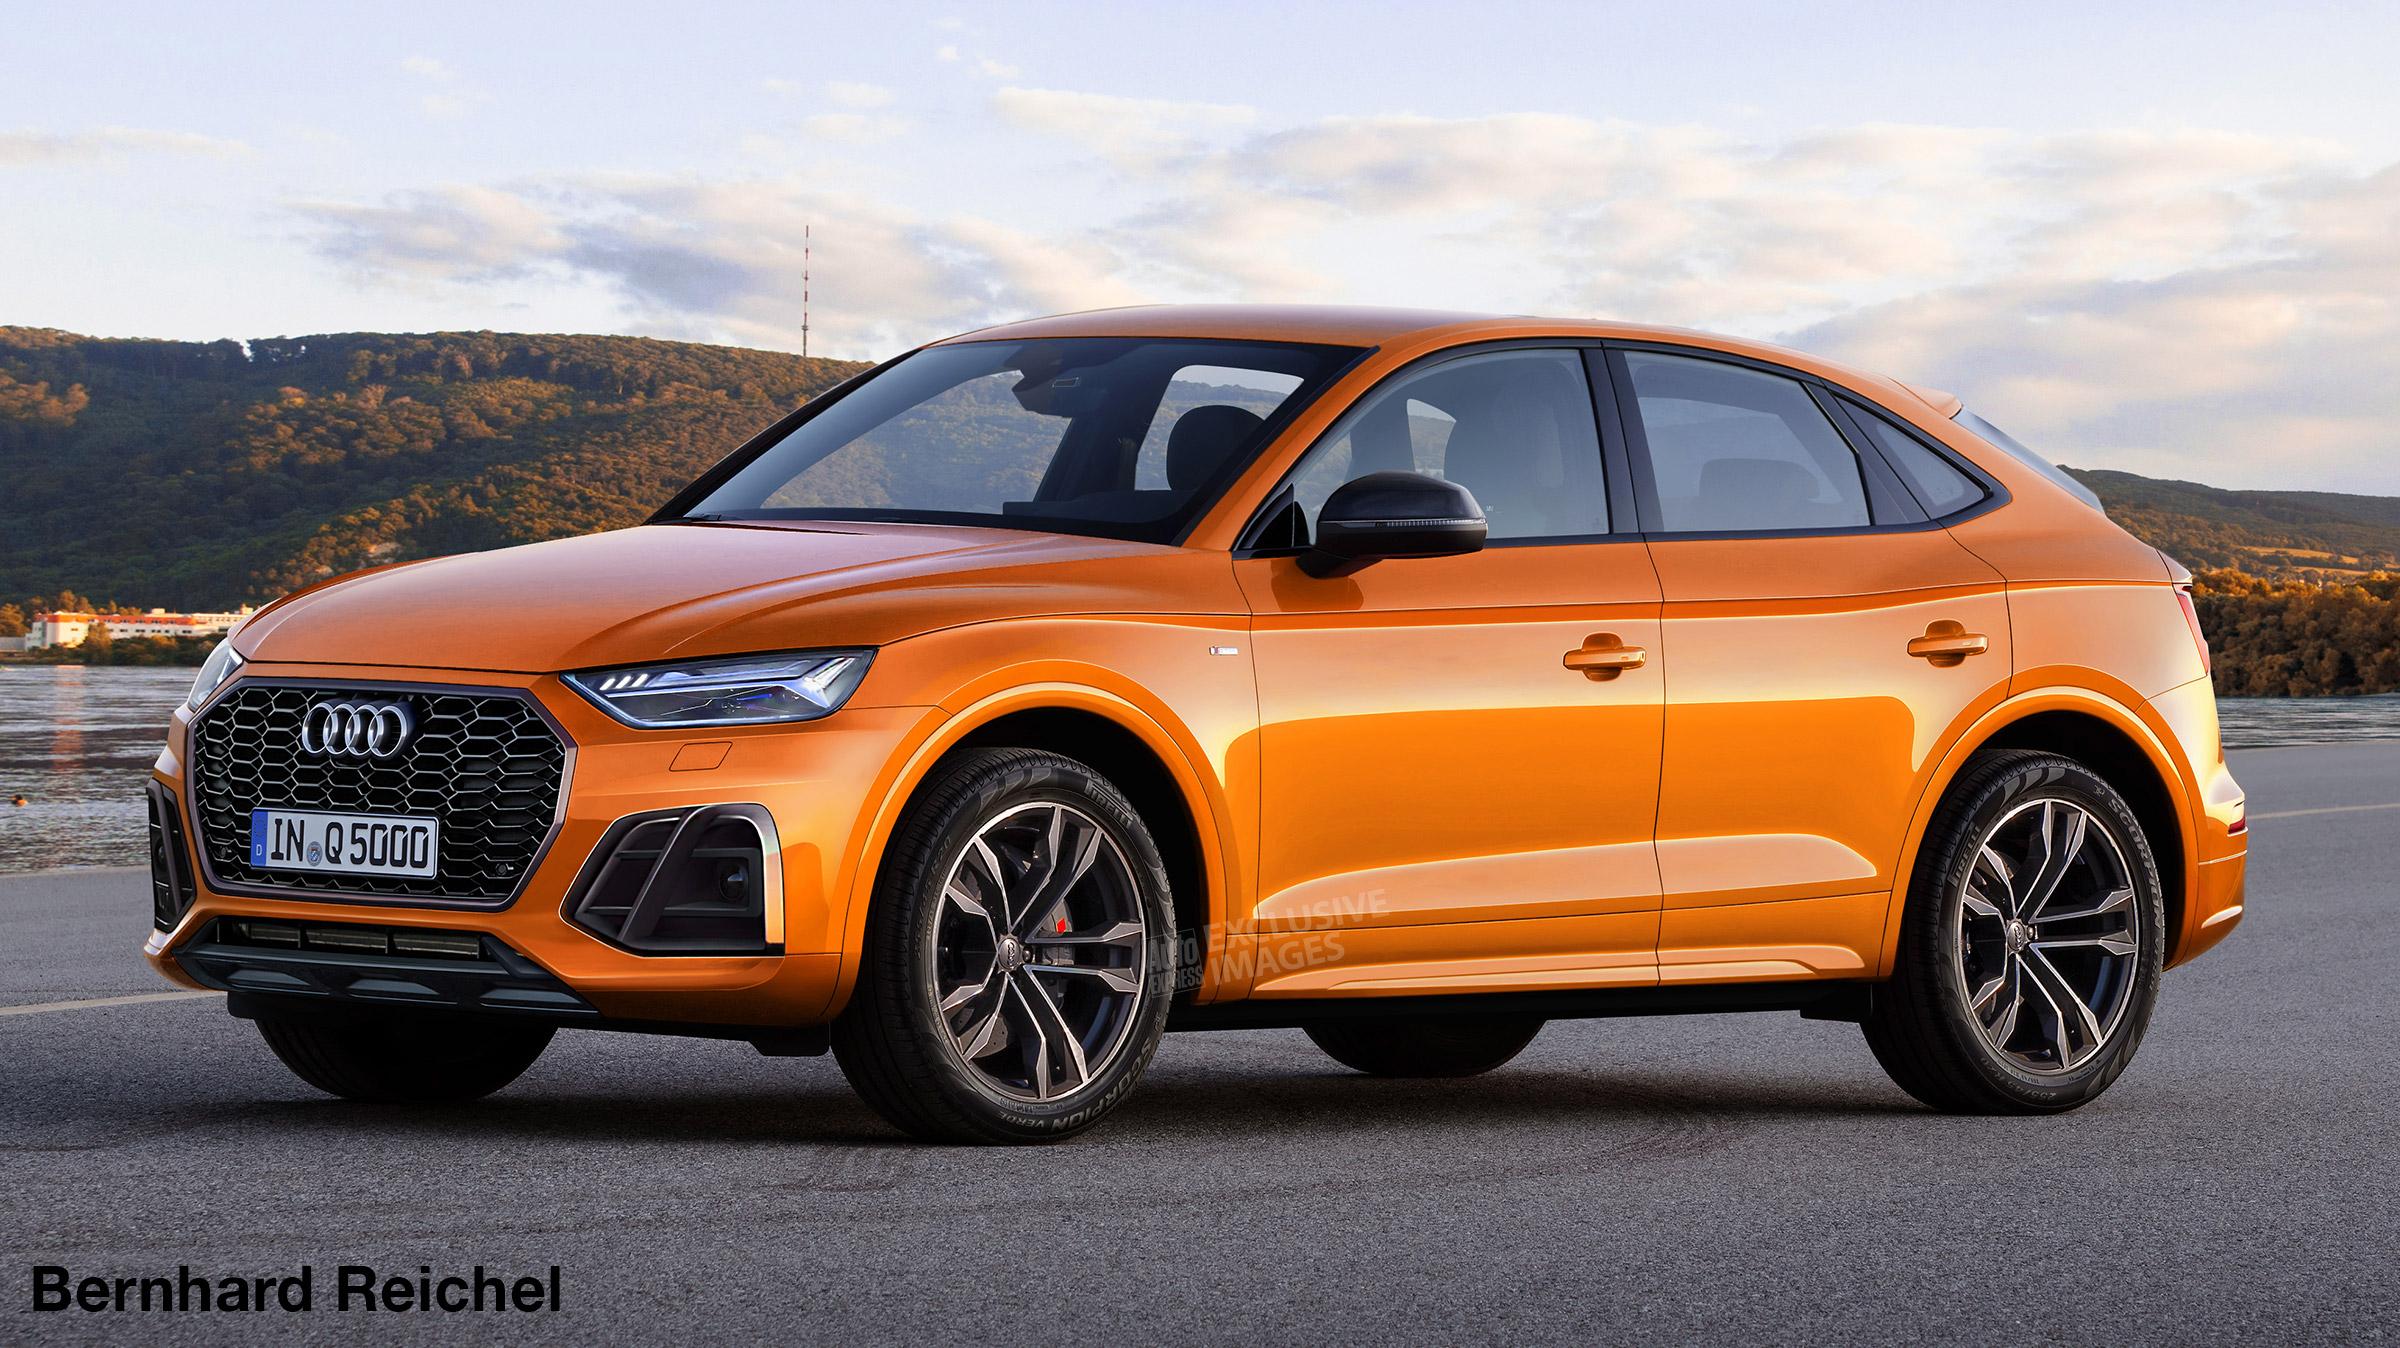 Auto Express Kia >> New 2020 Audi Q5 Sportback to join new look SUV's range | Auto Express